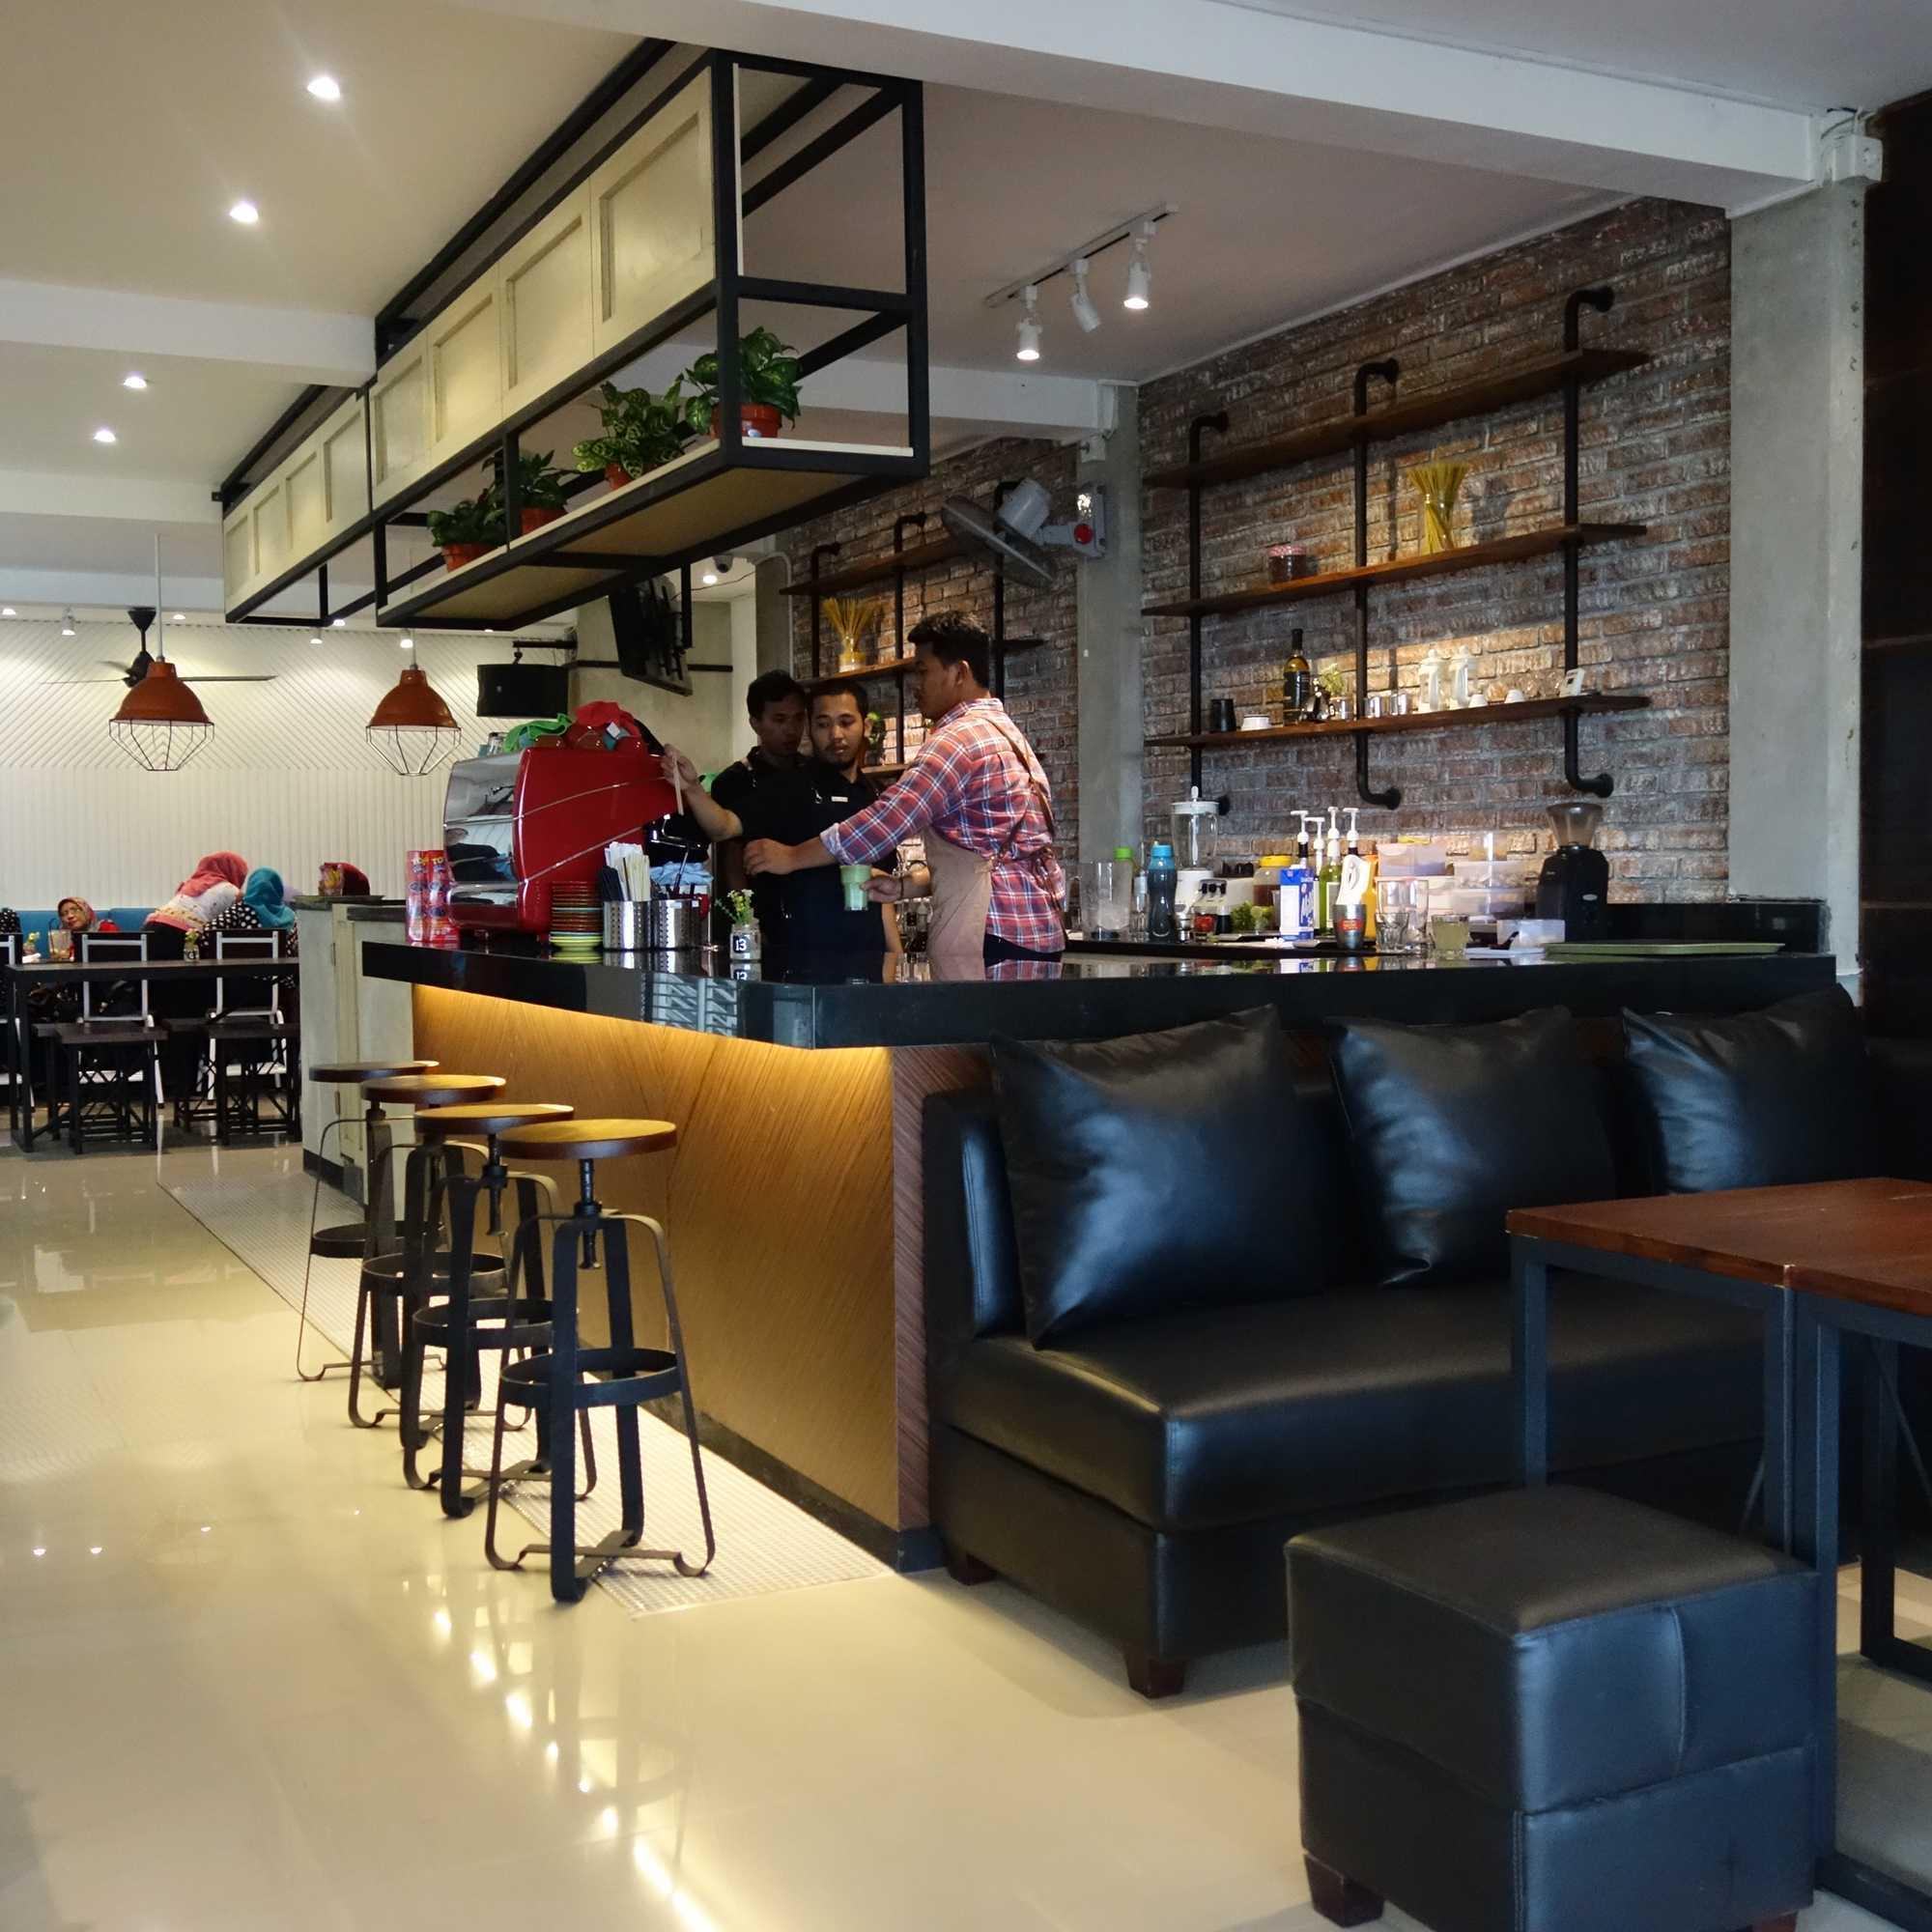 Aditya Wira Hardi Prague Coffee And Eatery Madiun, Kota Madiun, Jawa Timur, Indonesia Madiun, Kota Madiun, Jawa Timur, Indonesia Aditya-Wira-Hardi-Prague-Coffee-And-Eatery   65905